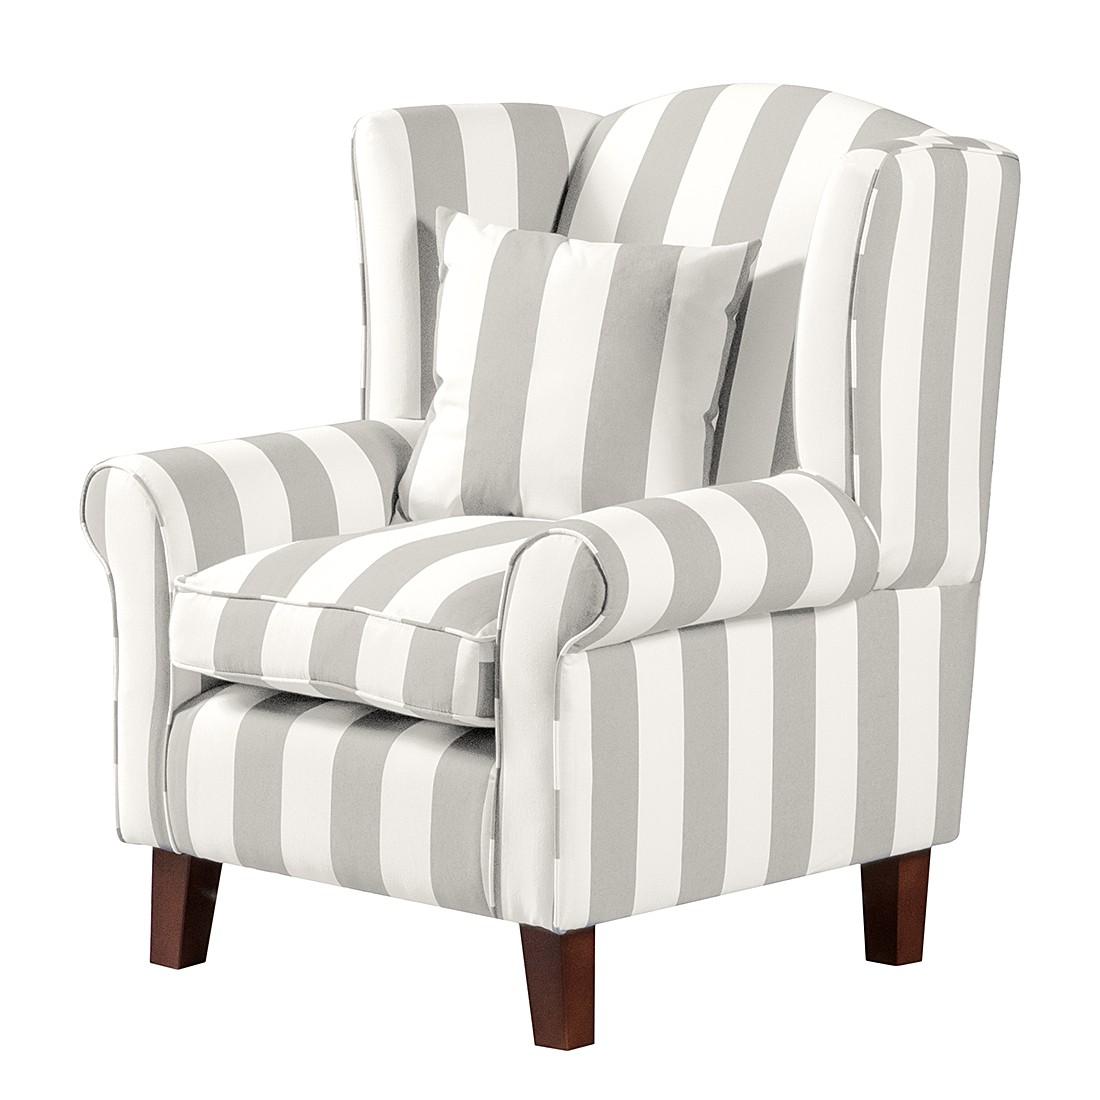 ohrensessel kariert gallery of ein sessel in beige kariert with ohrensessel kariert. Black Bedroom Furniture Sets. Home Design Ideas